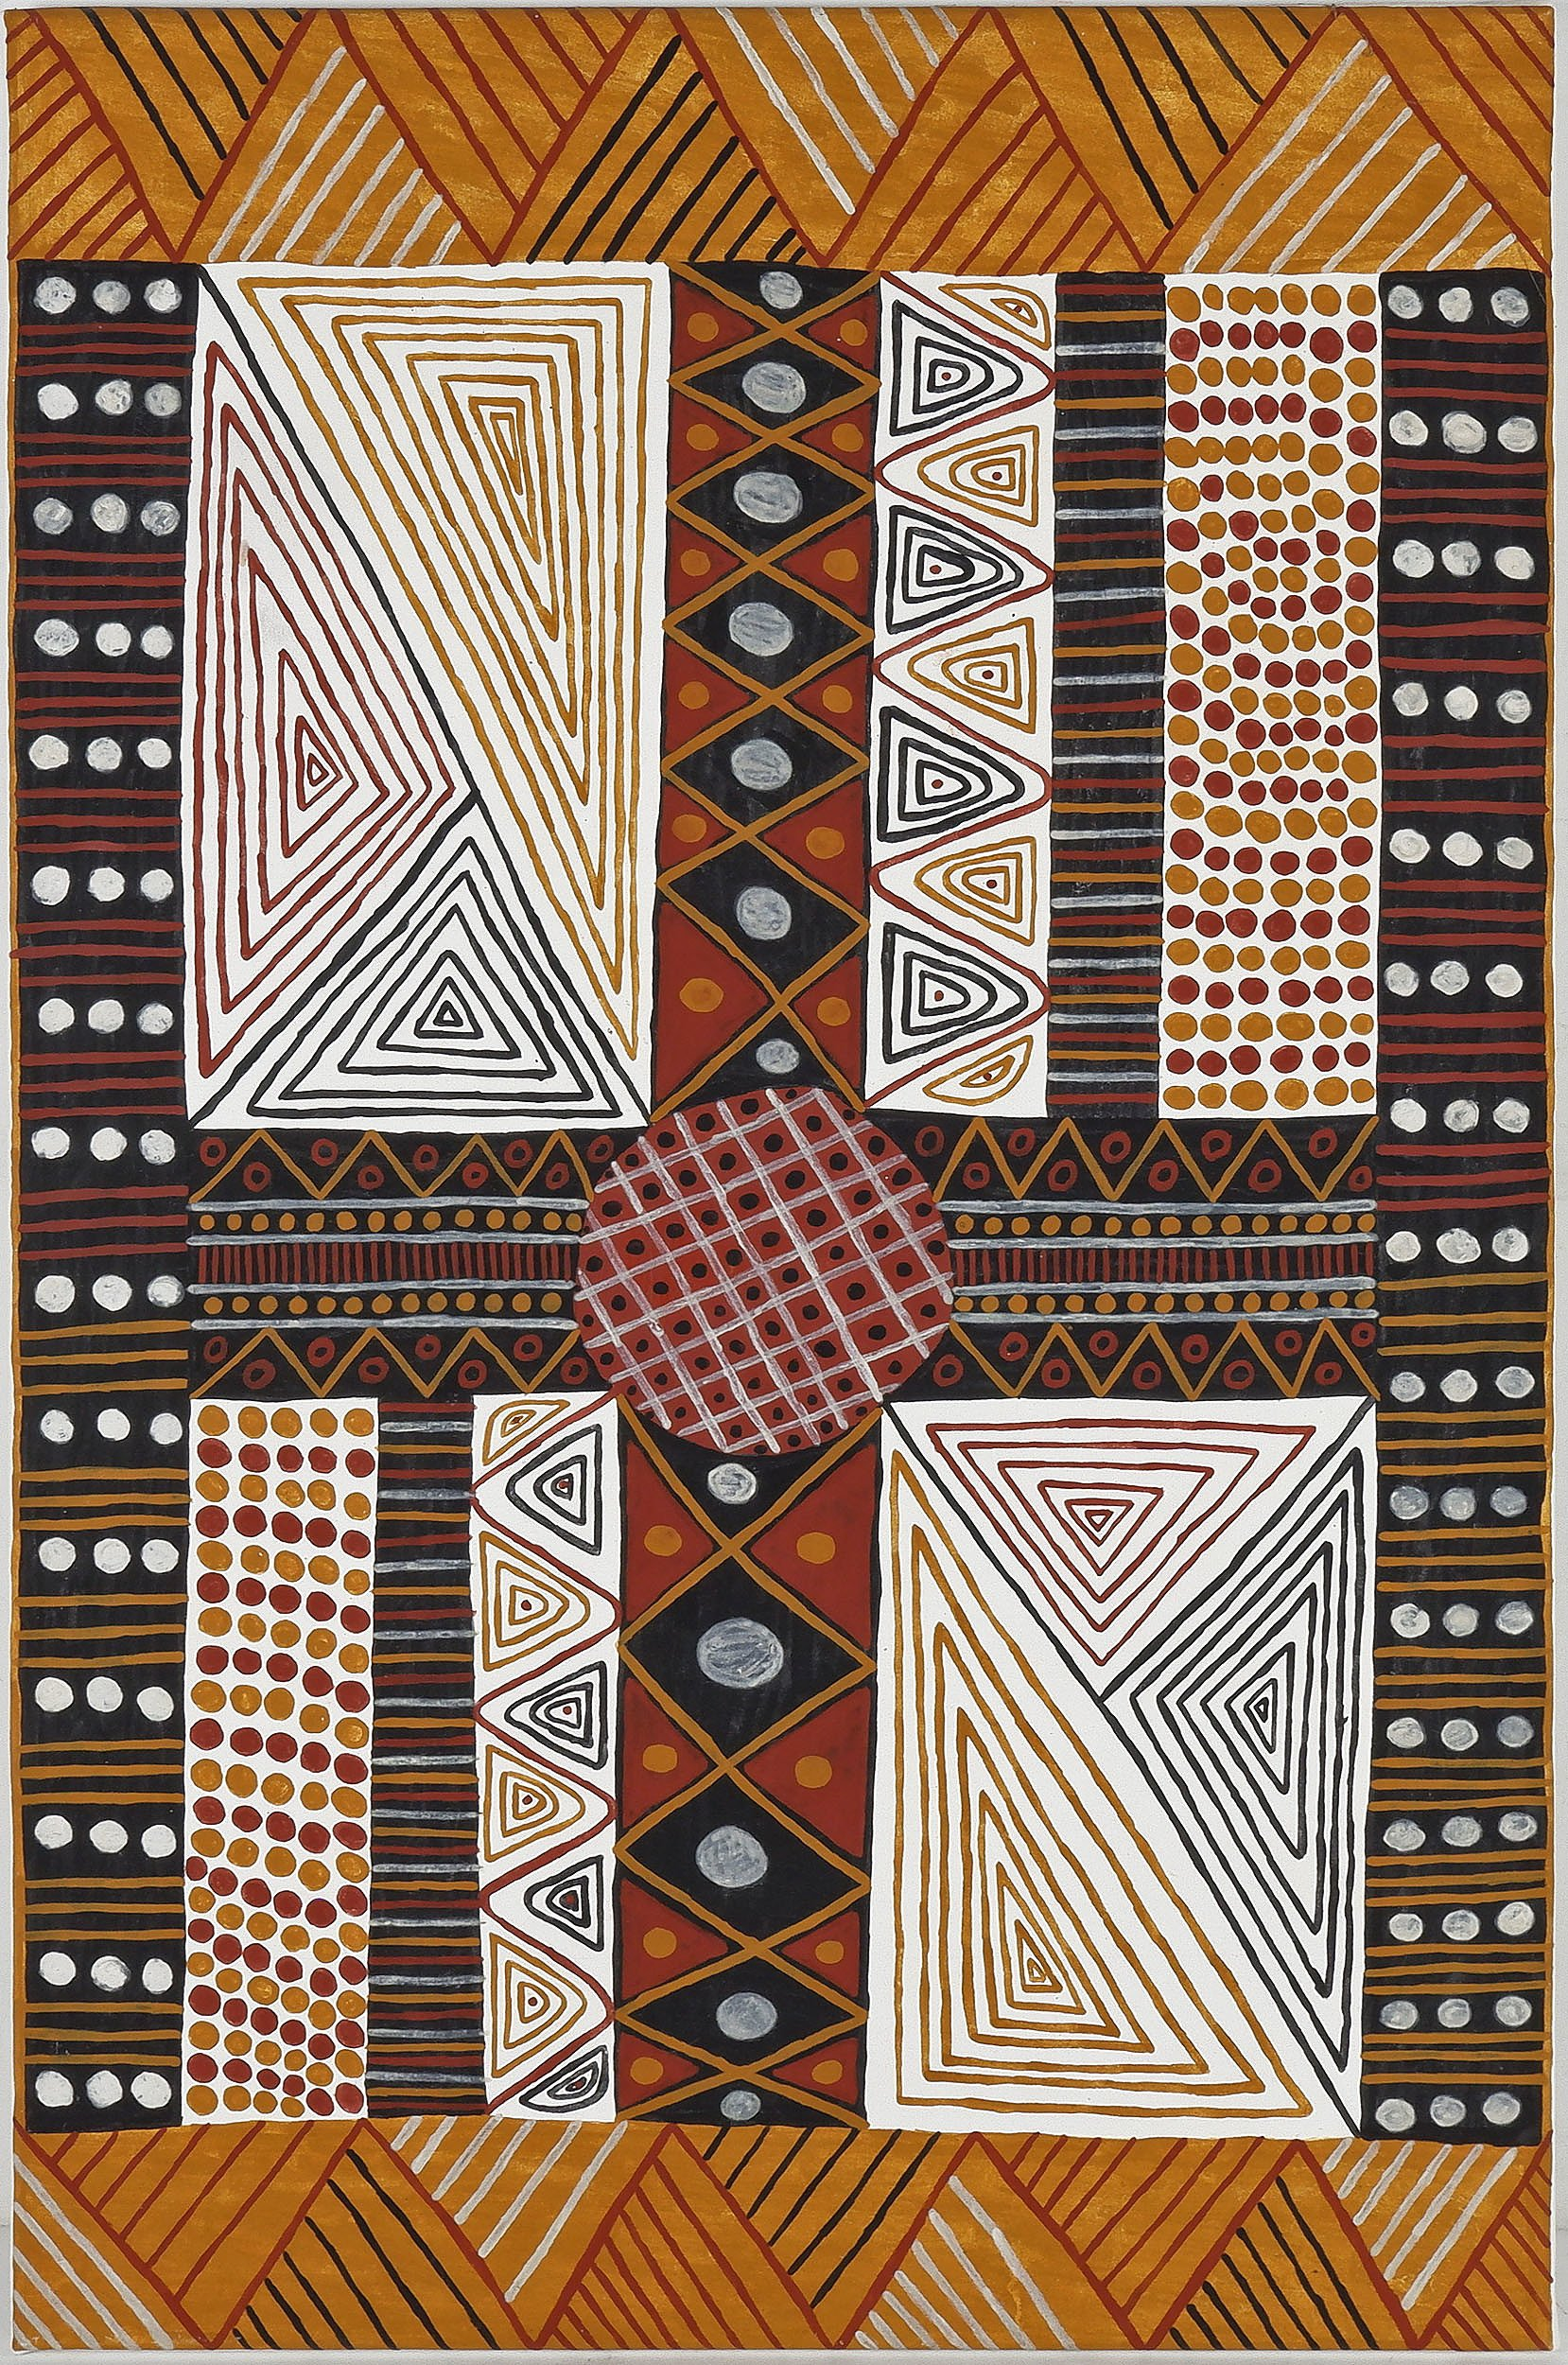 'Simona Wonaeamirri (Dates Unknown) Acrylic on Canvas'